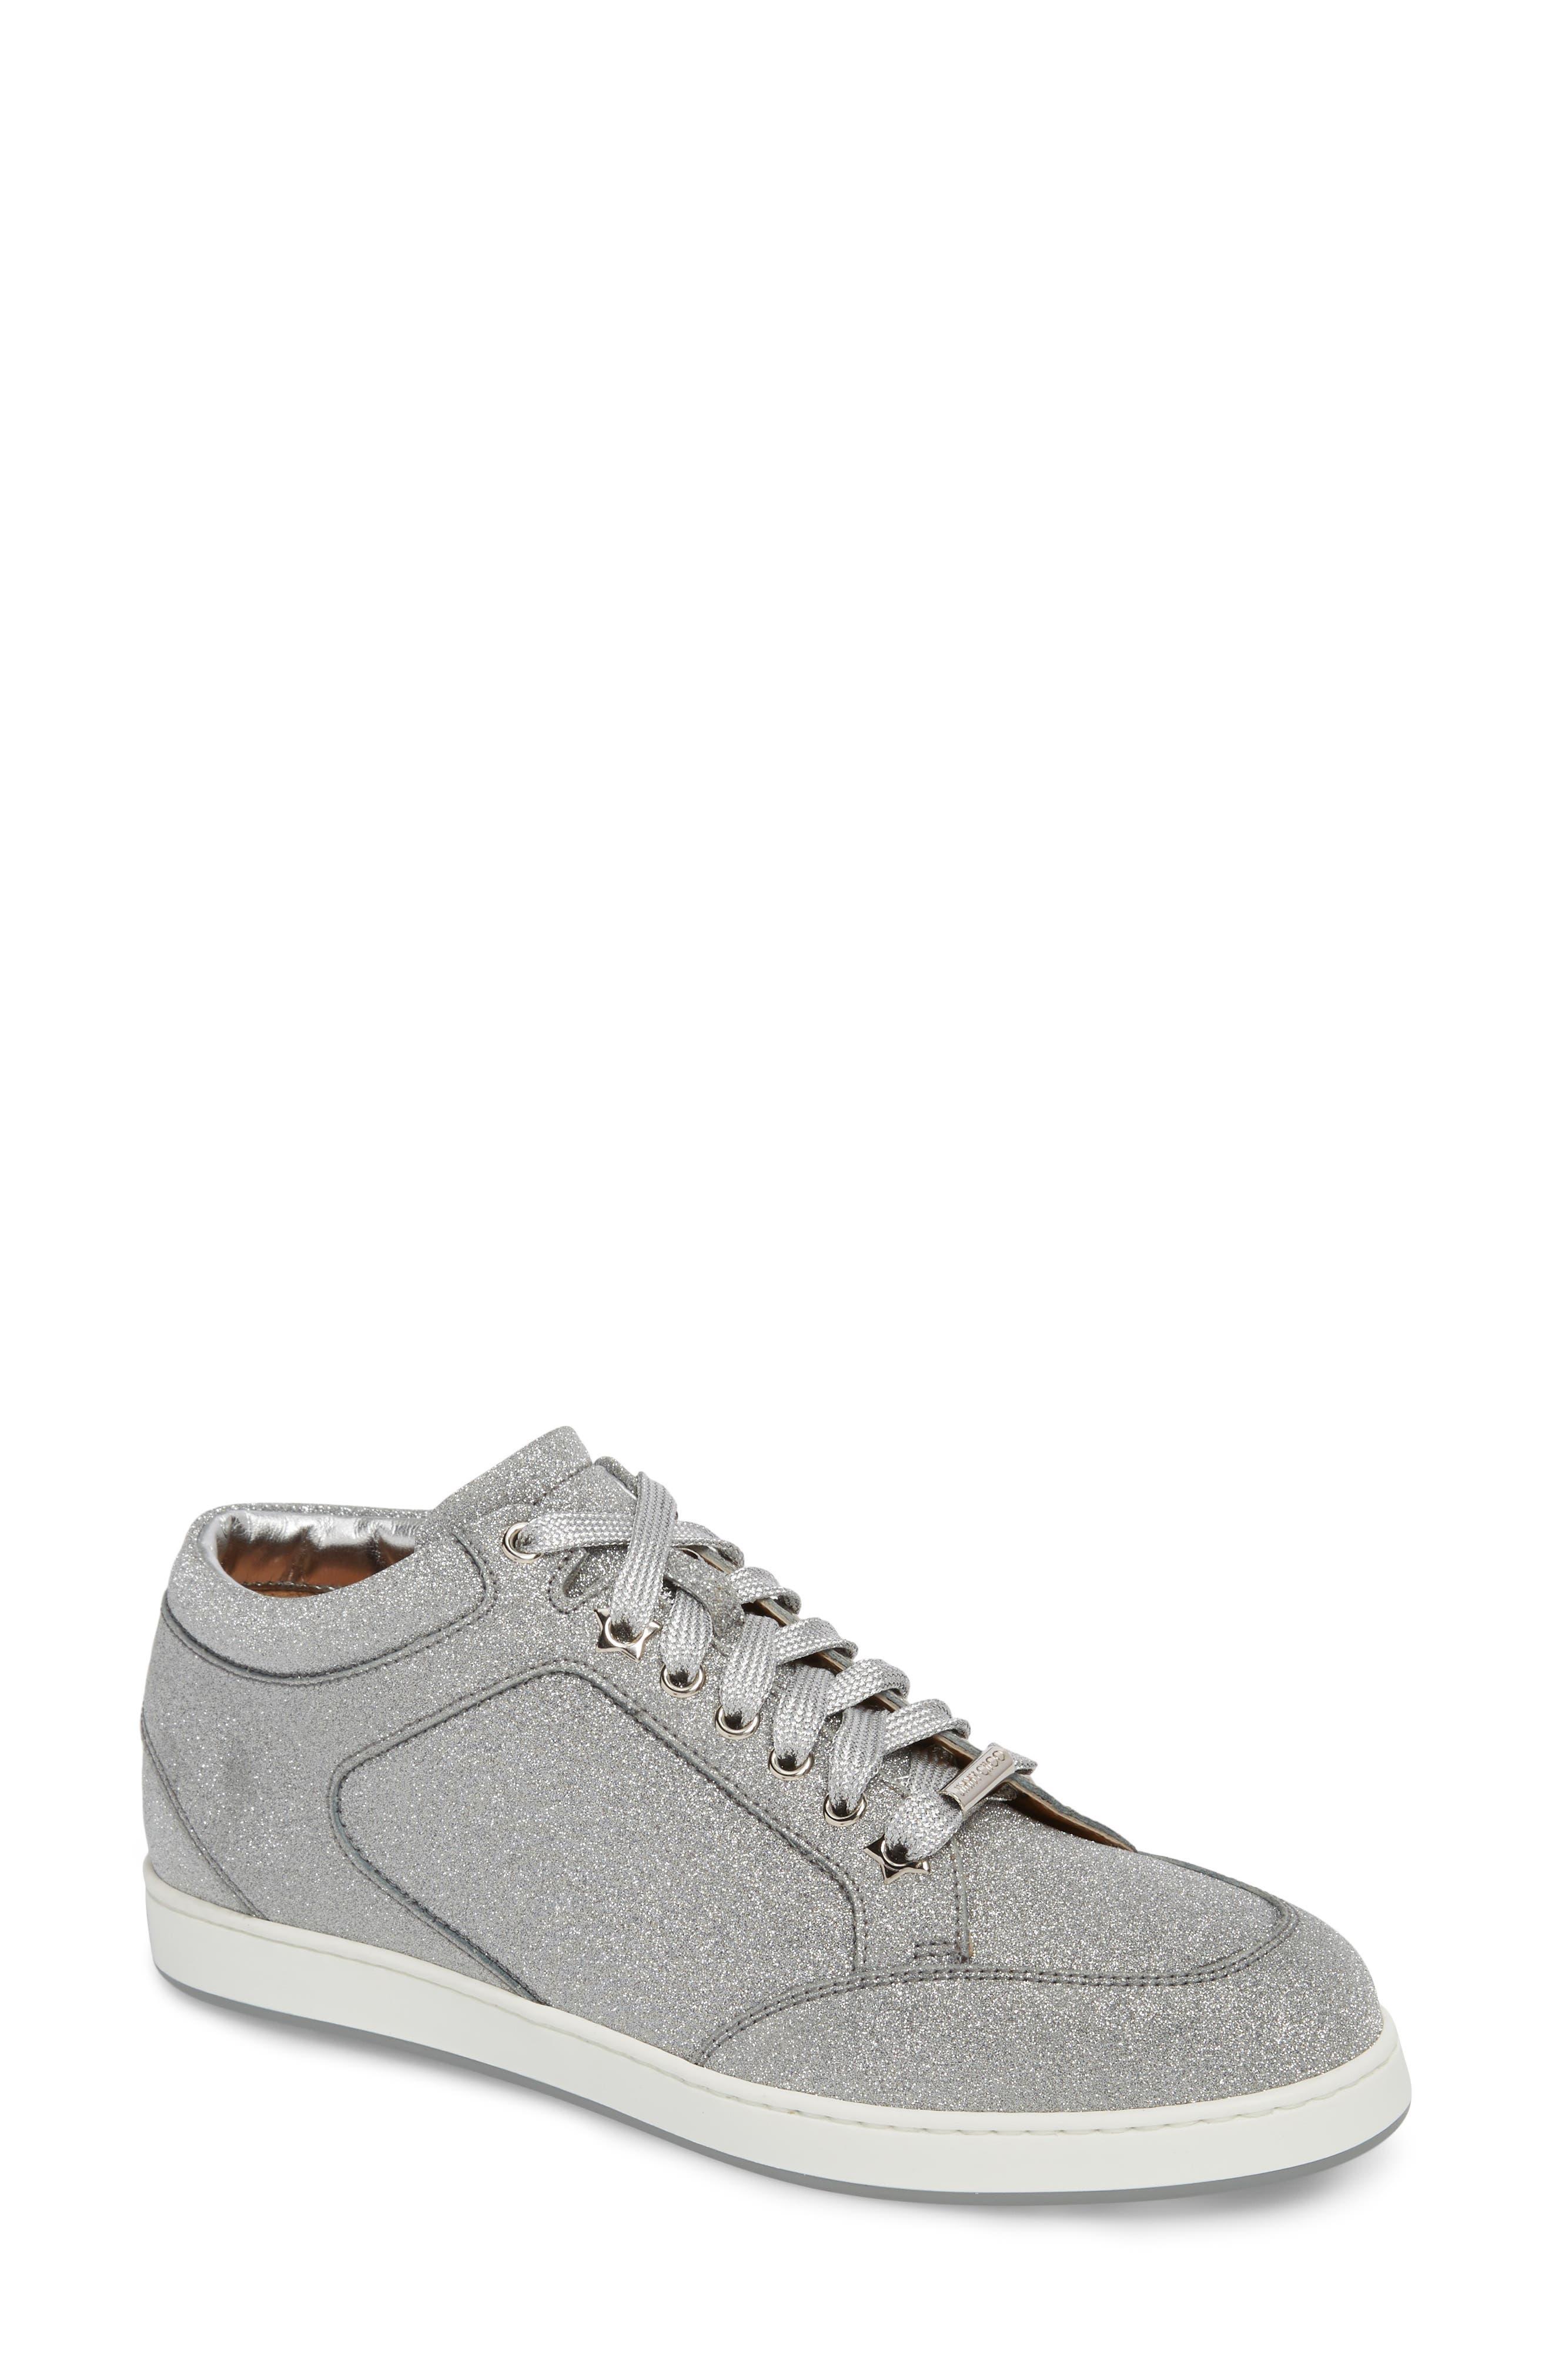 Miami Metallic Sneaker,                             Main thumbnail 1, color,                             Silver